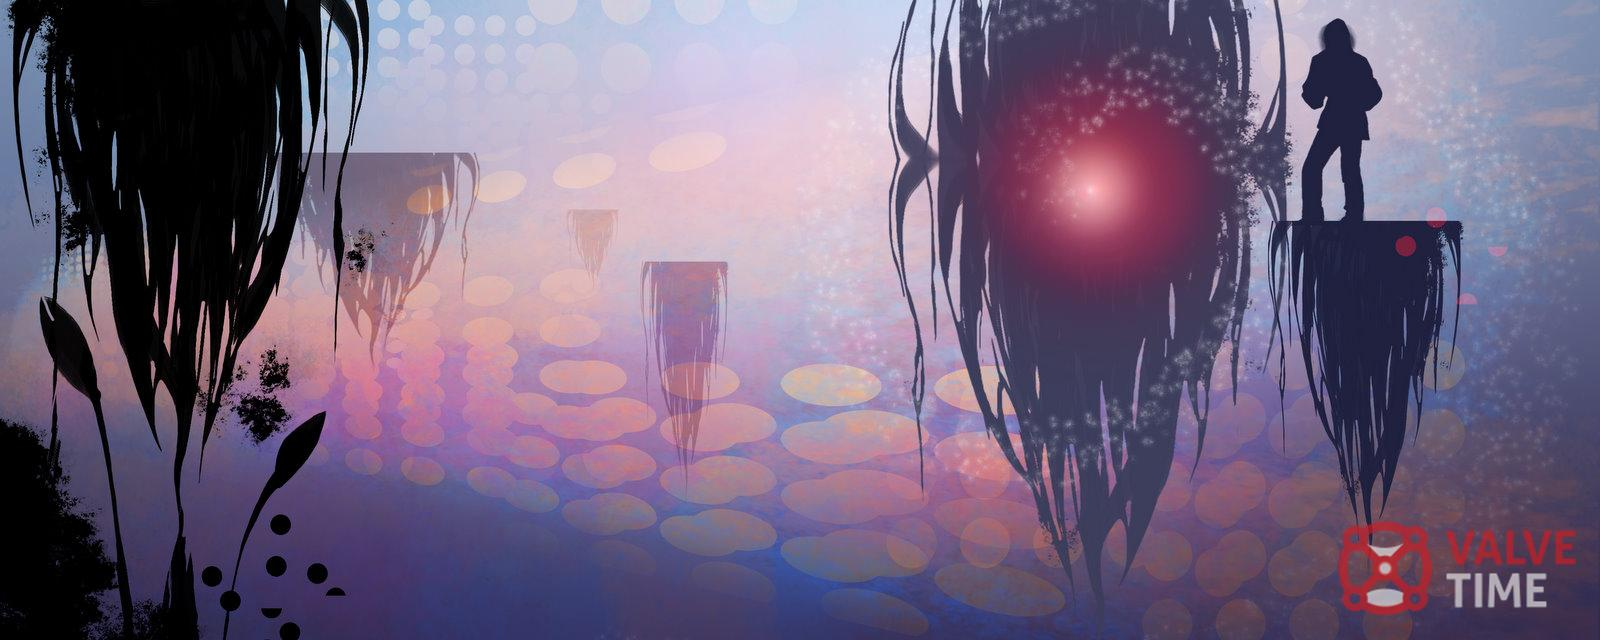 Na internetu se objevila série artworků Half-Life 2: Episode Three z roku 2008 67256